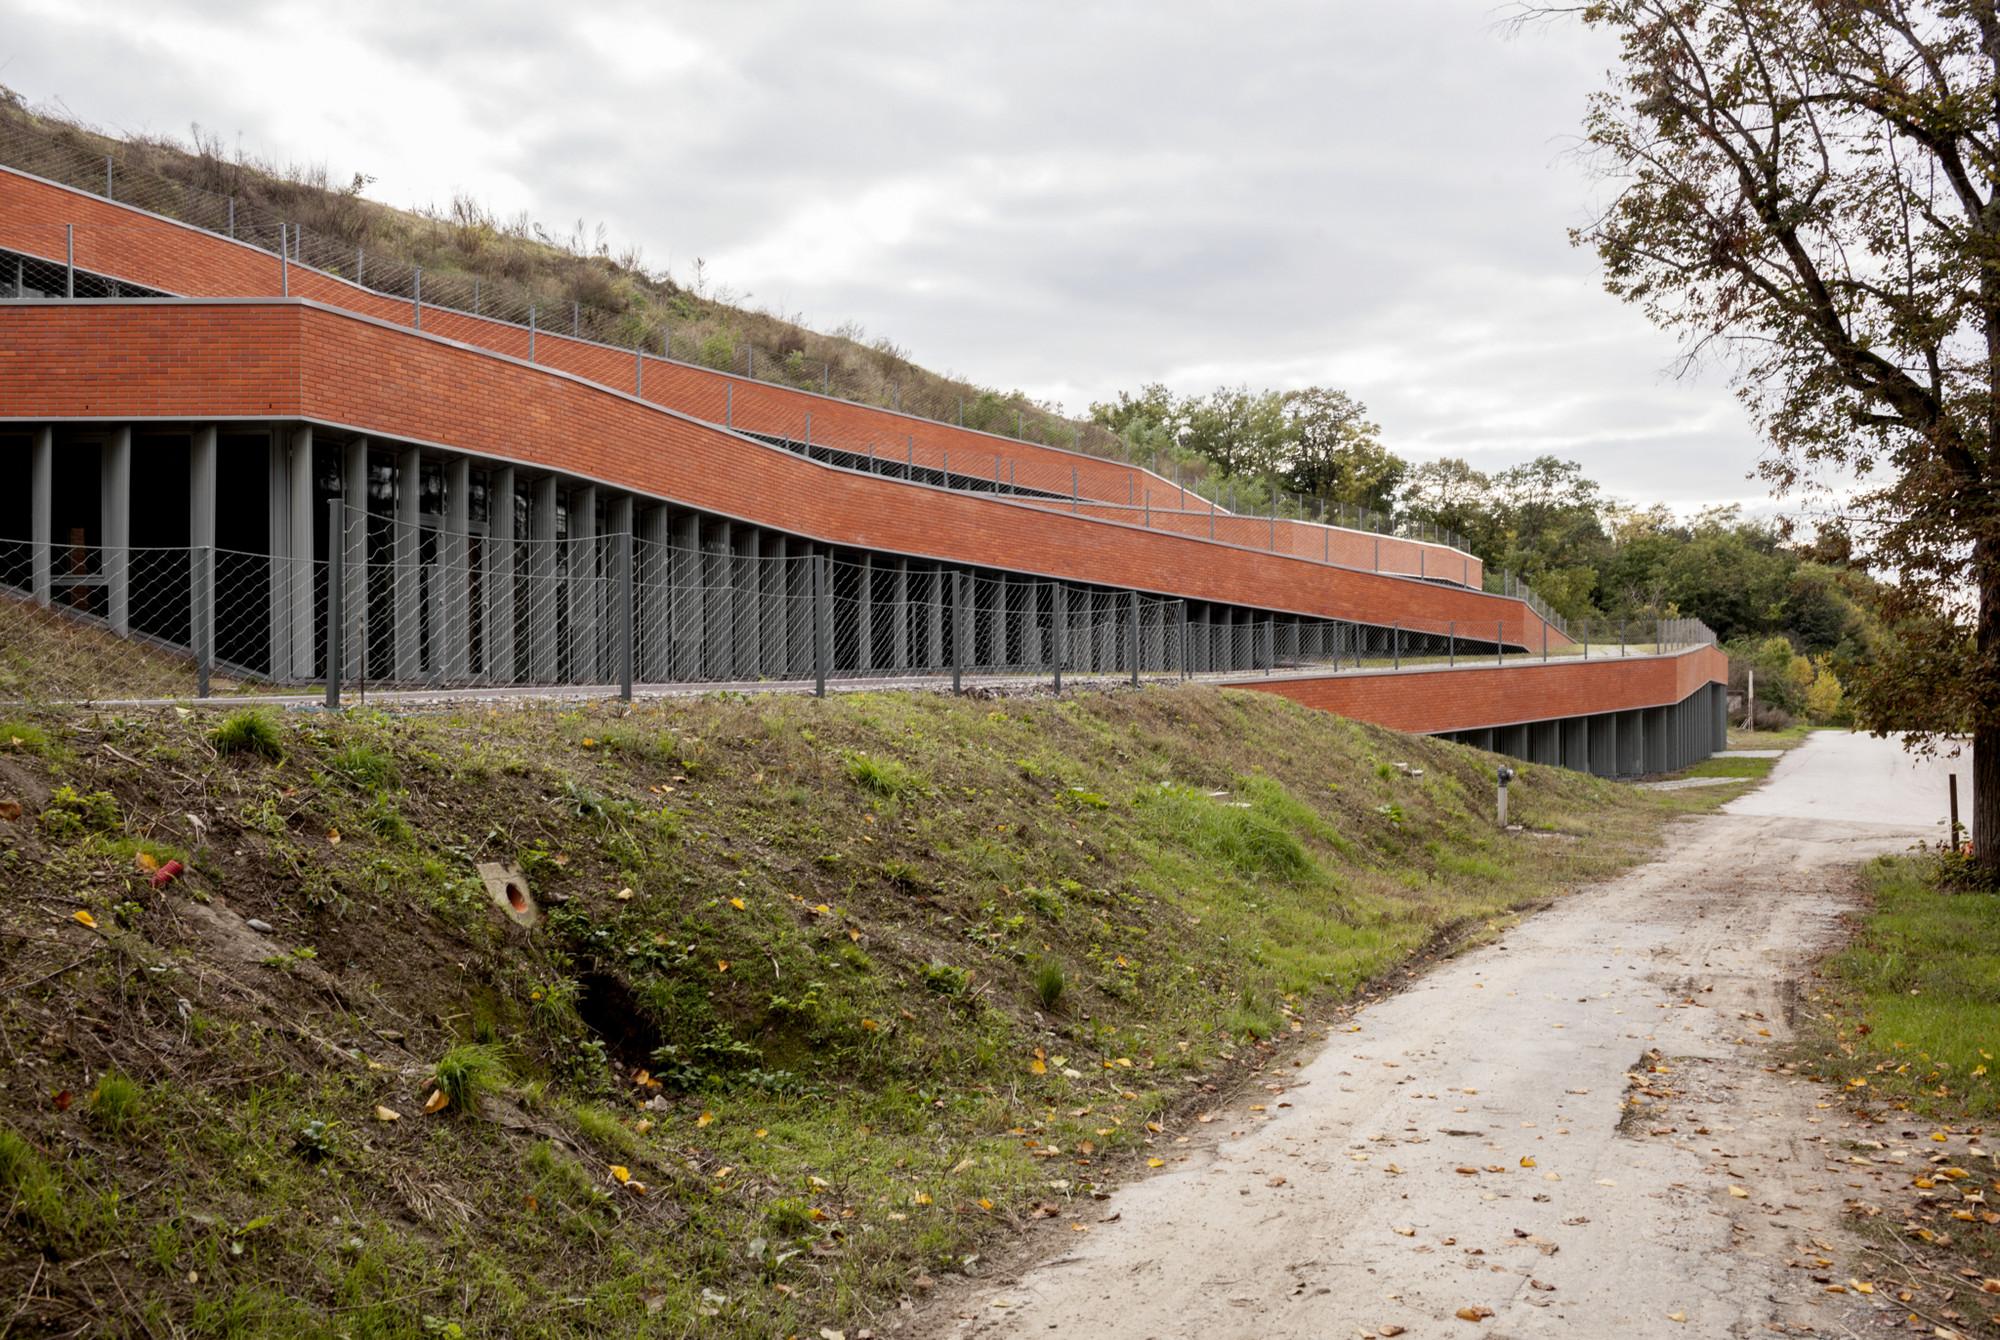 Vucedol Archaeological Museum / Radionica Arhitekture